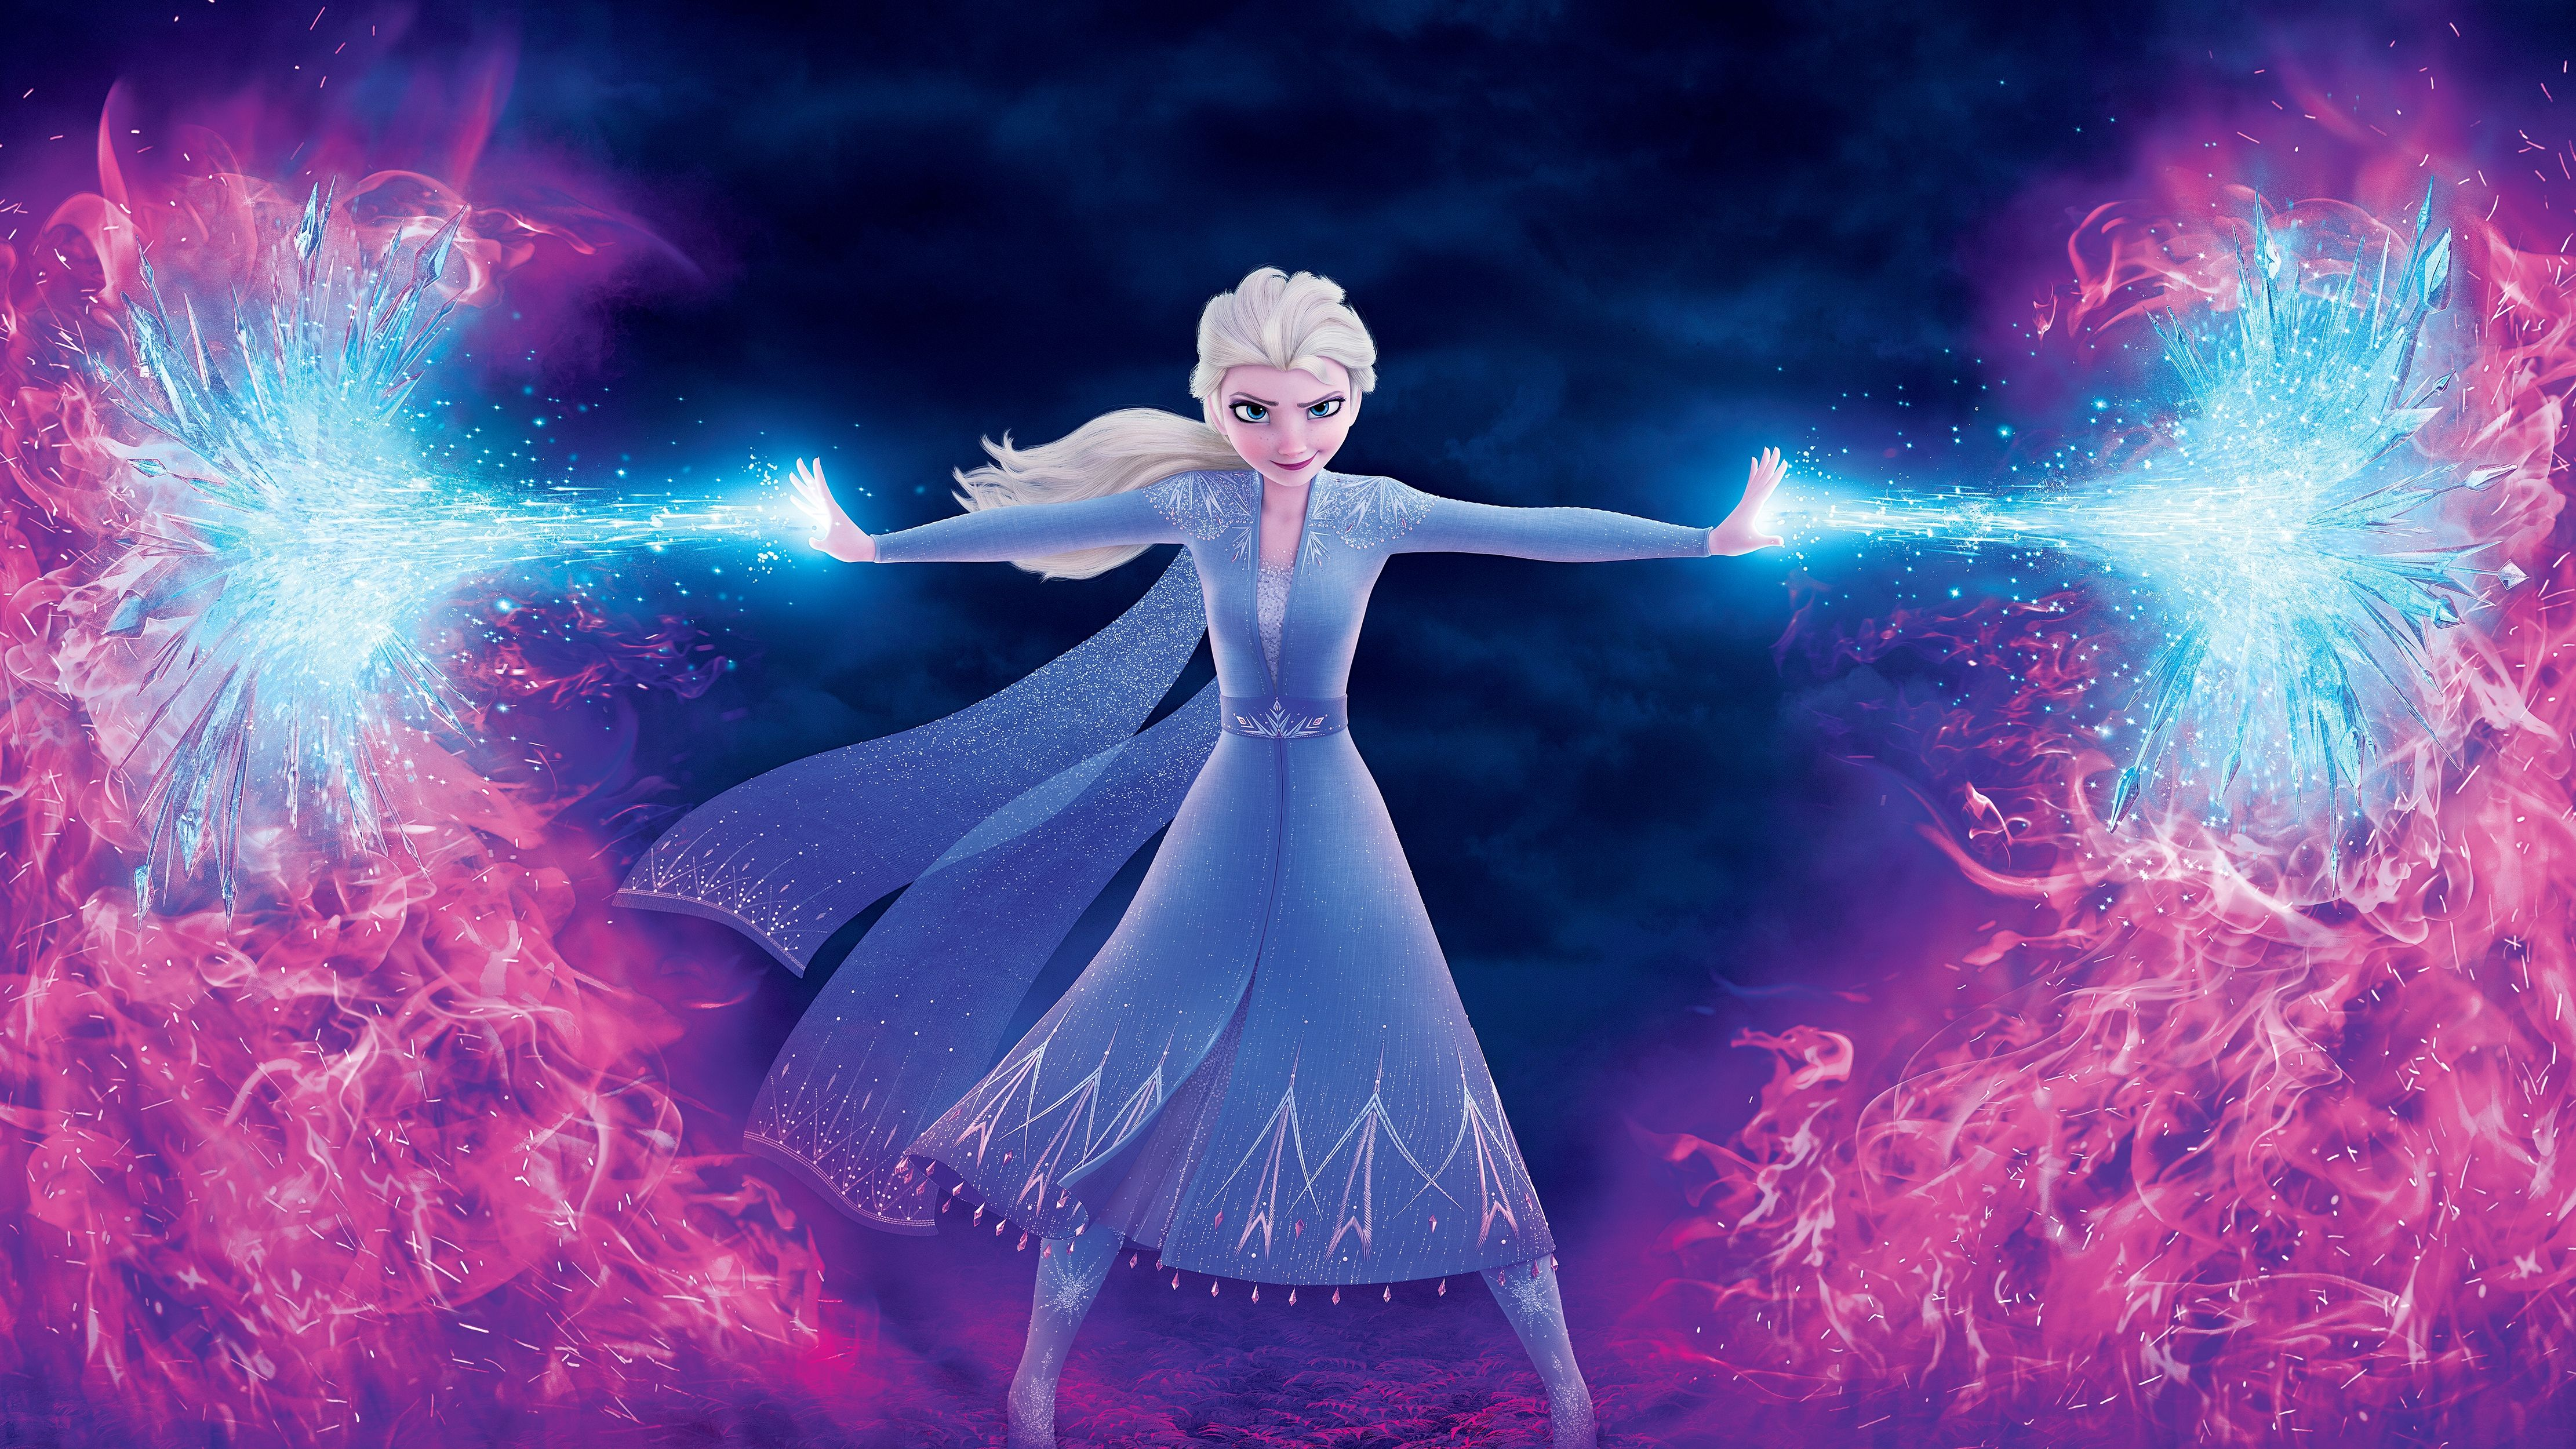 Frozen 2 2019 Elsa Wallpaper Textless By Mintmovi3 Disney Princess Frozen Frozen Disney Movie Elsa Pictures